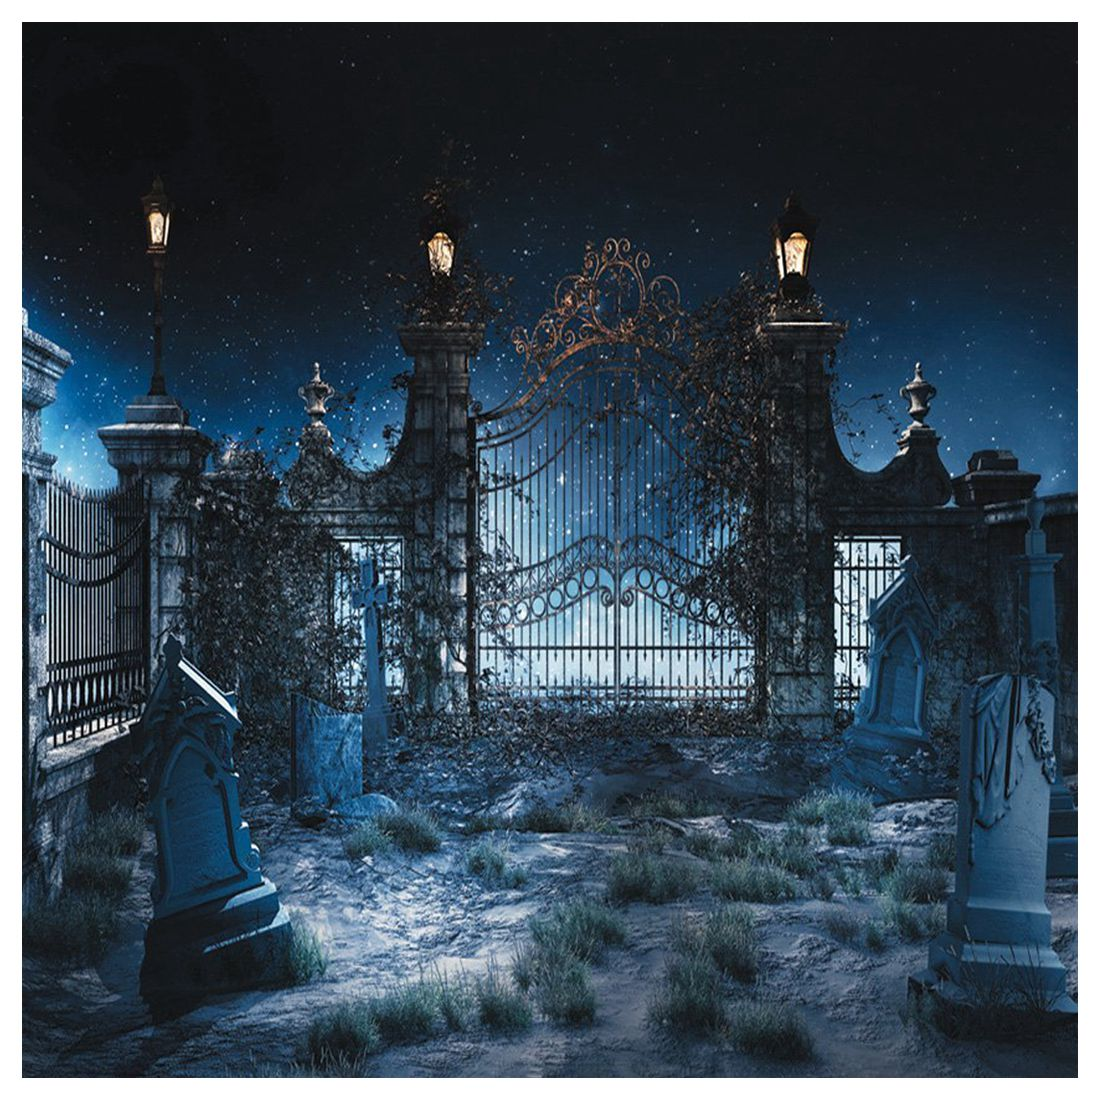 Halloween Vinyl Photography Backdrop Photo Background Studio Prop 5*7ft, Abandoned Garden abandoned villages